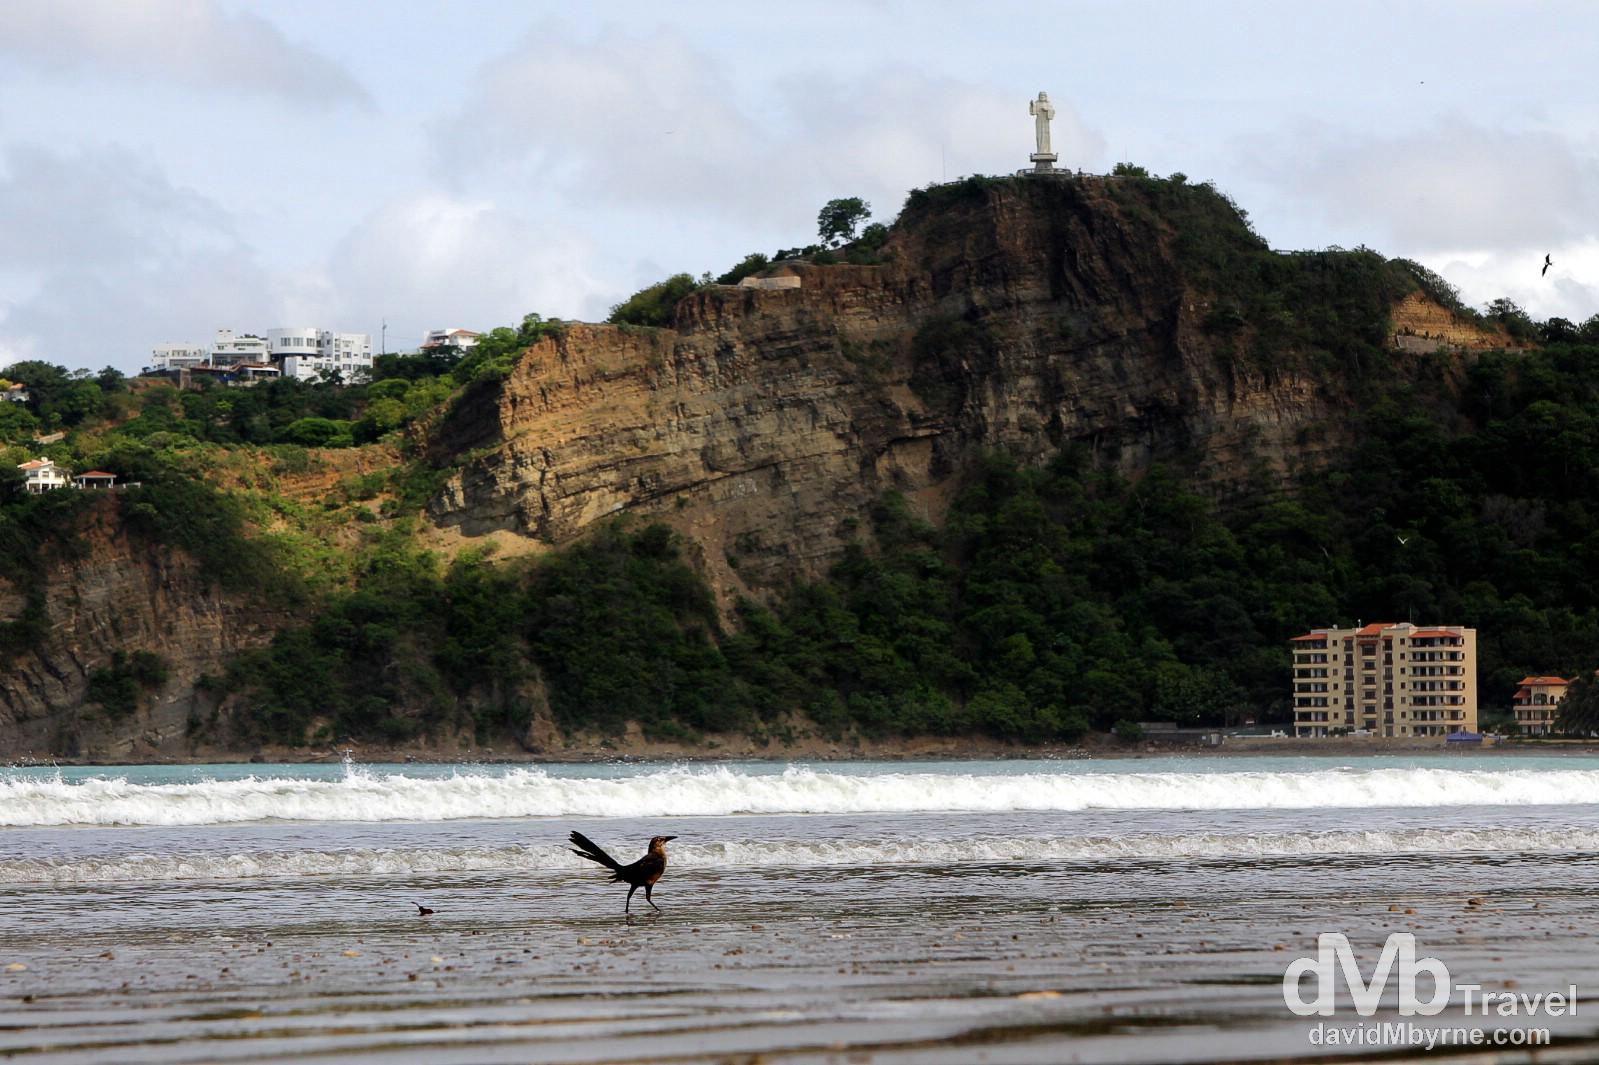 'Stunning cliffs'. San Juan Del Sur, Nicaragua. June 22nd 2013.